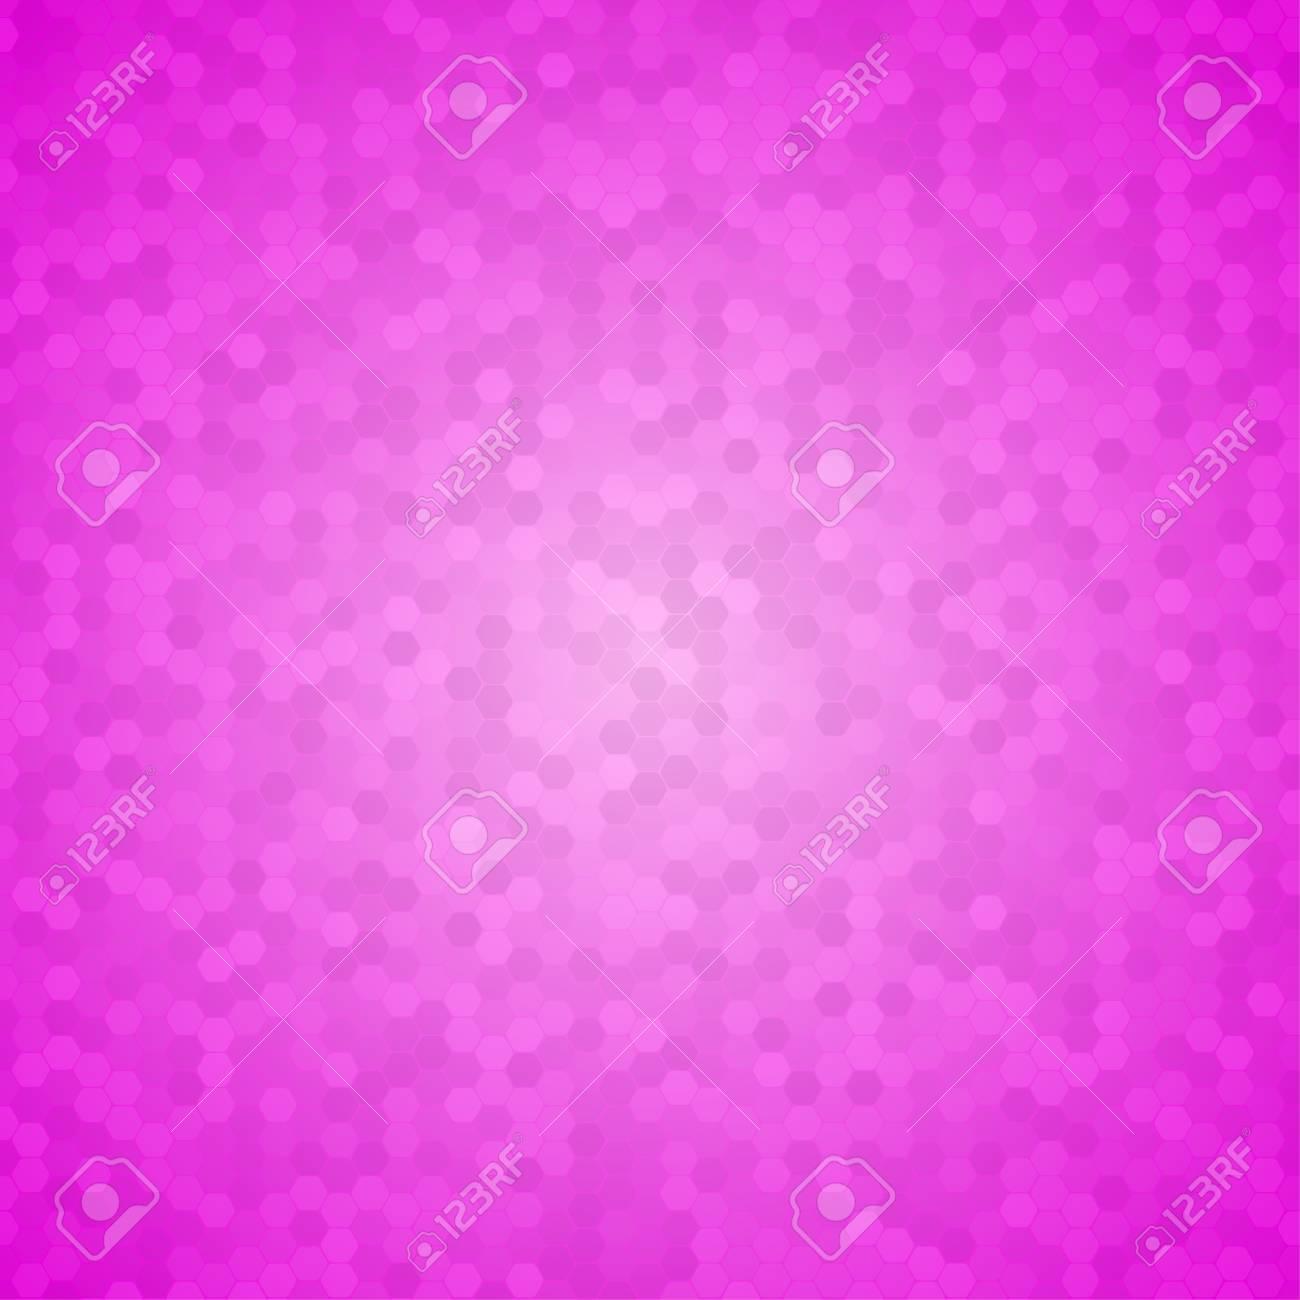 Mosaik Fliesen Honeycomb Vector Background Kamm Halbton Fone Rosa